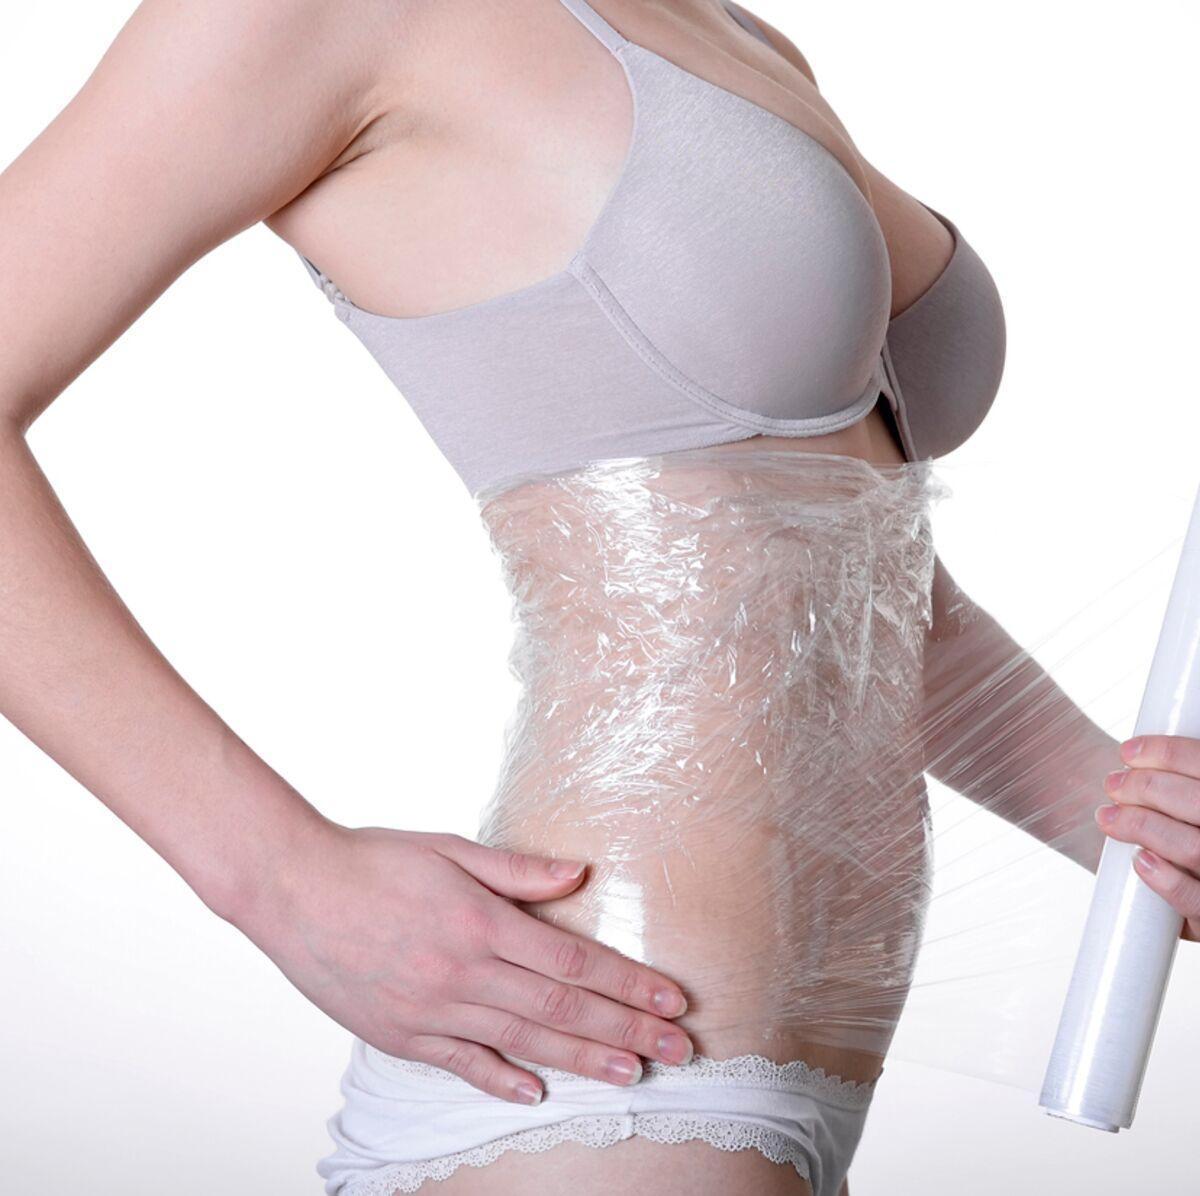 enveloppement corporel naturel de perte de poids biologie perte de poids